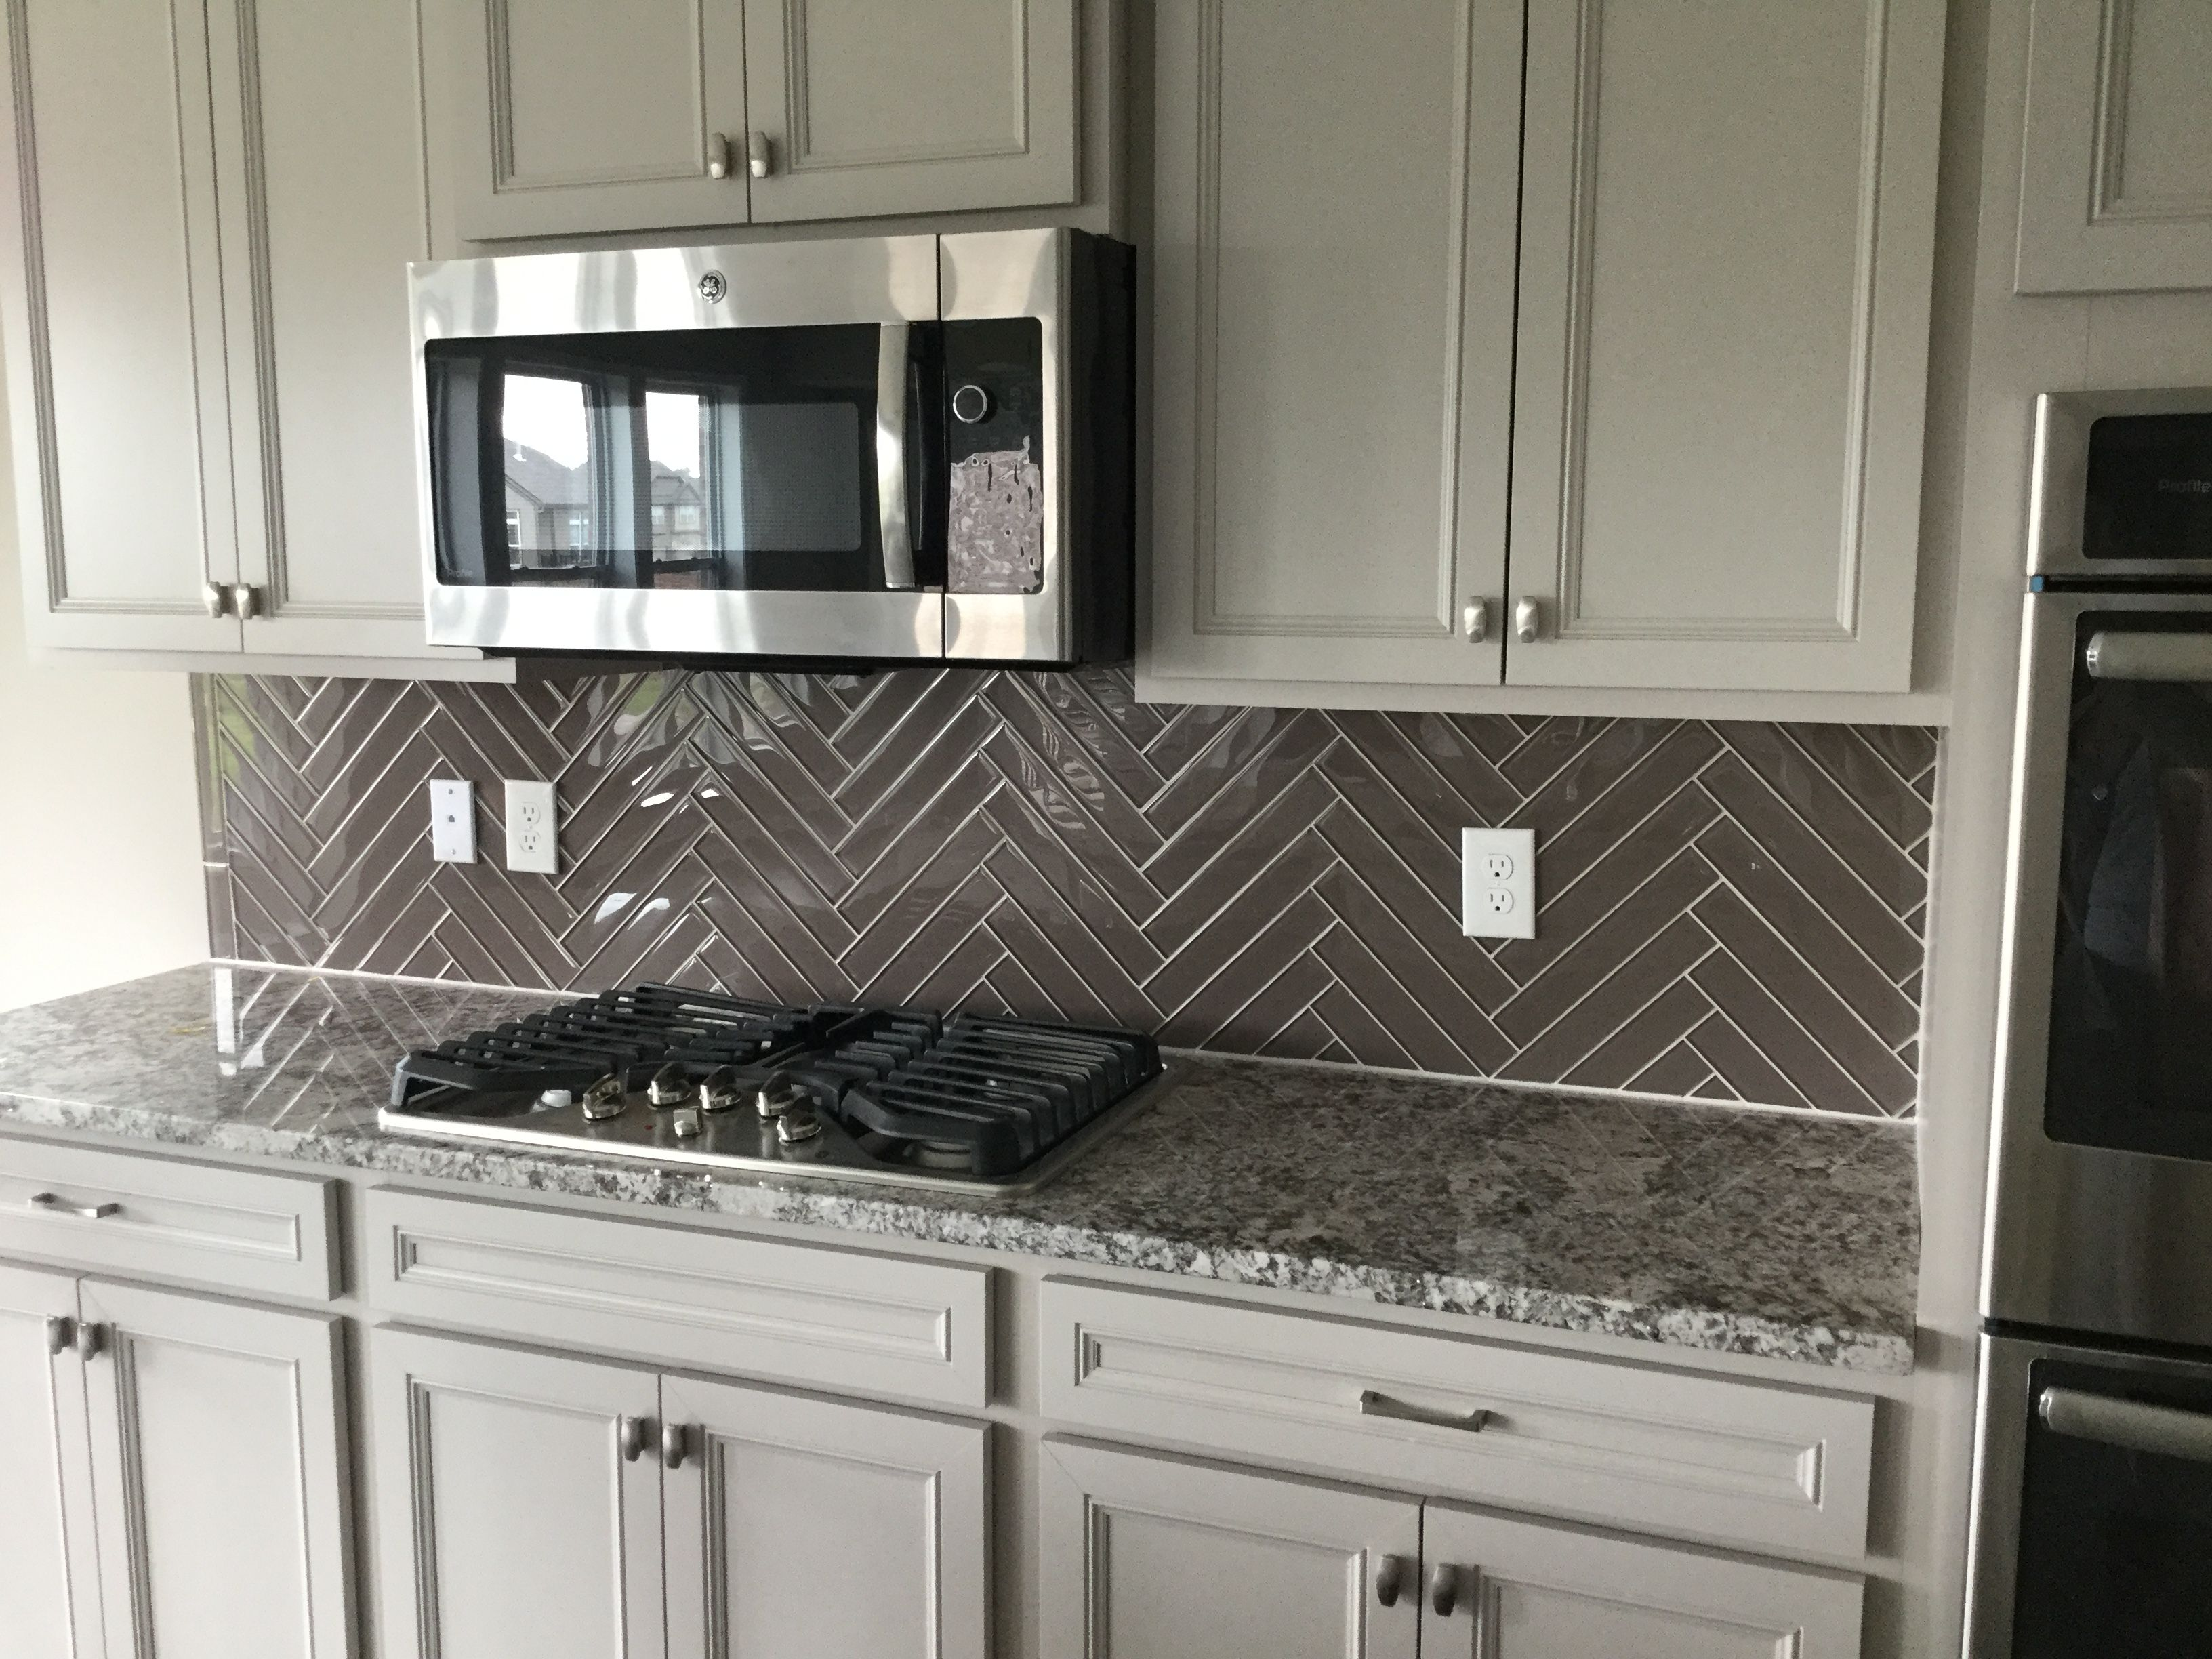 2x12 glass tile in herringbone pattern